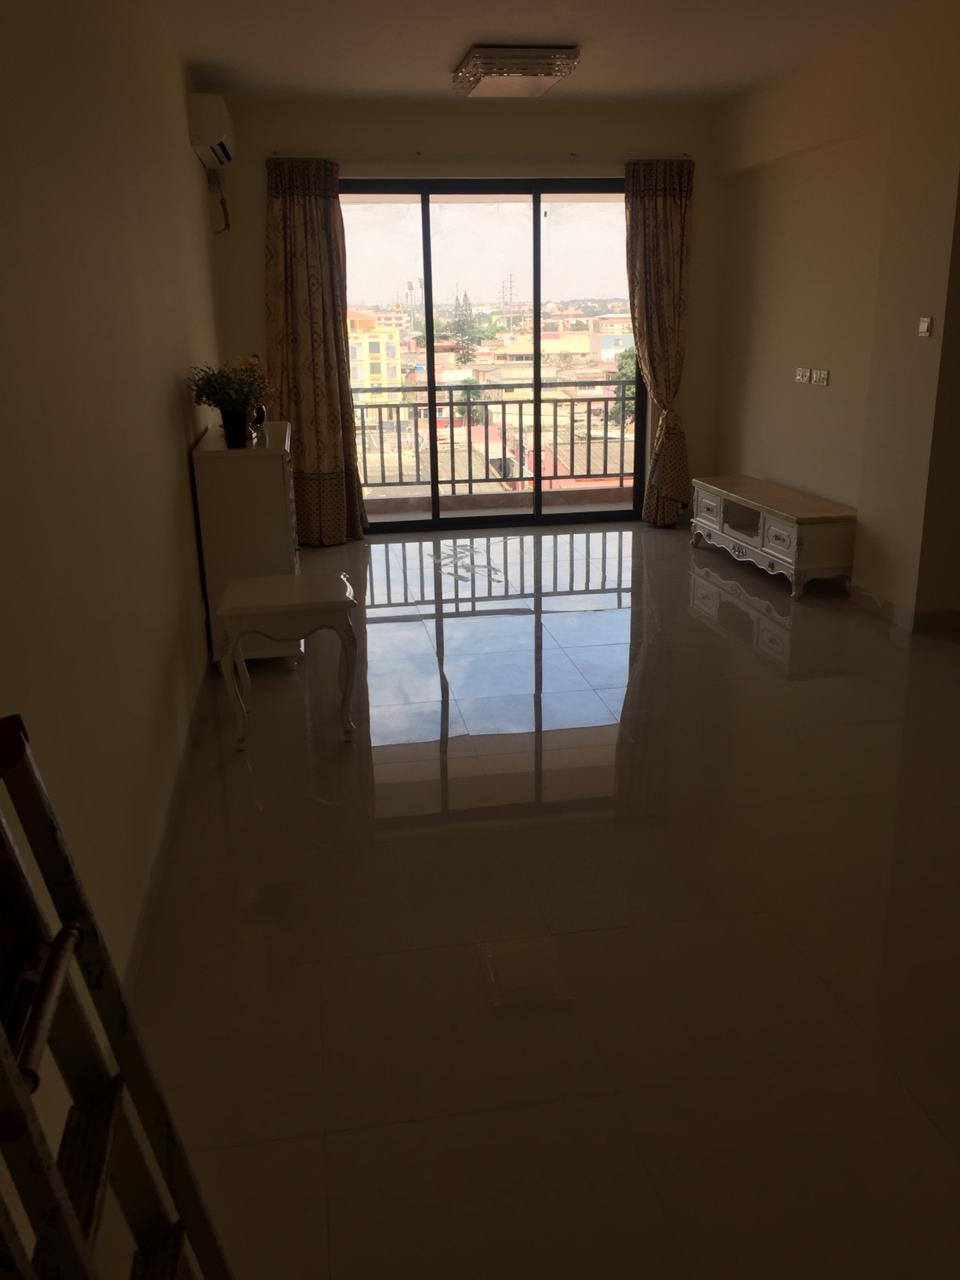 Arrendamos apartamento no condomínio Santos bikuku